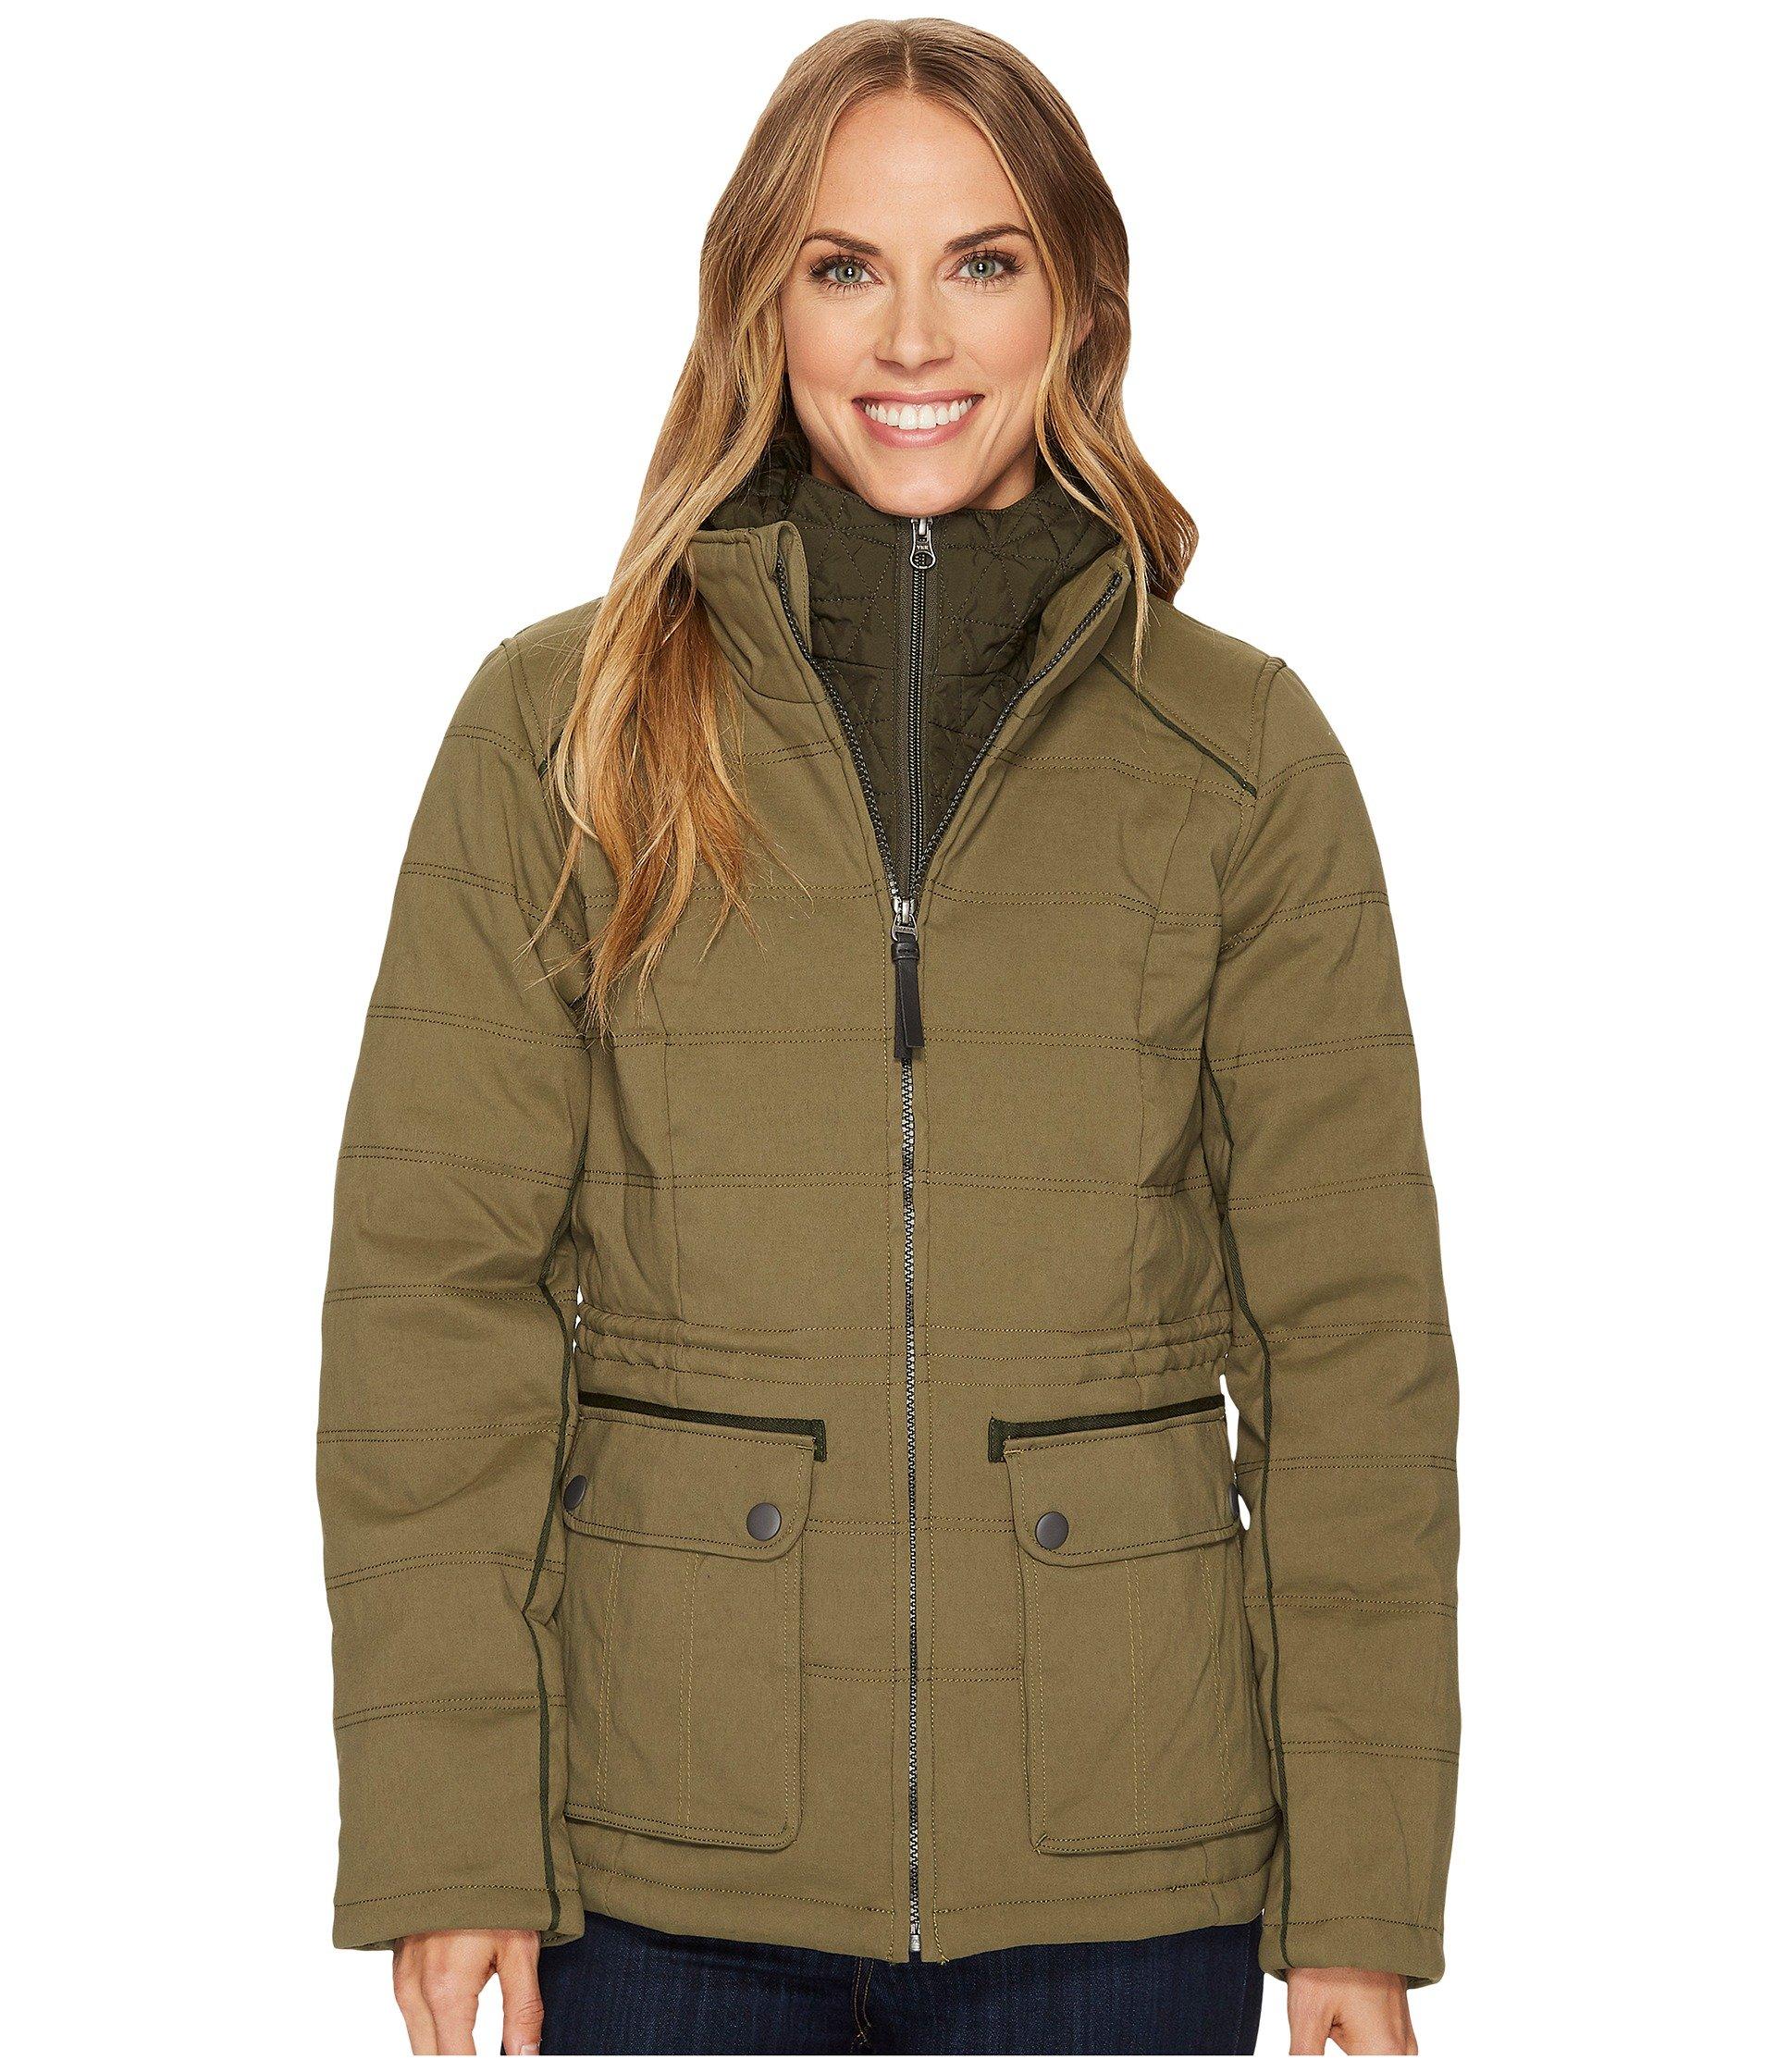 Prana Halle Insulated Jacket At Zappos Com